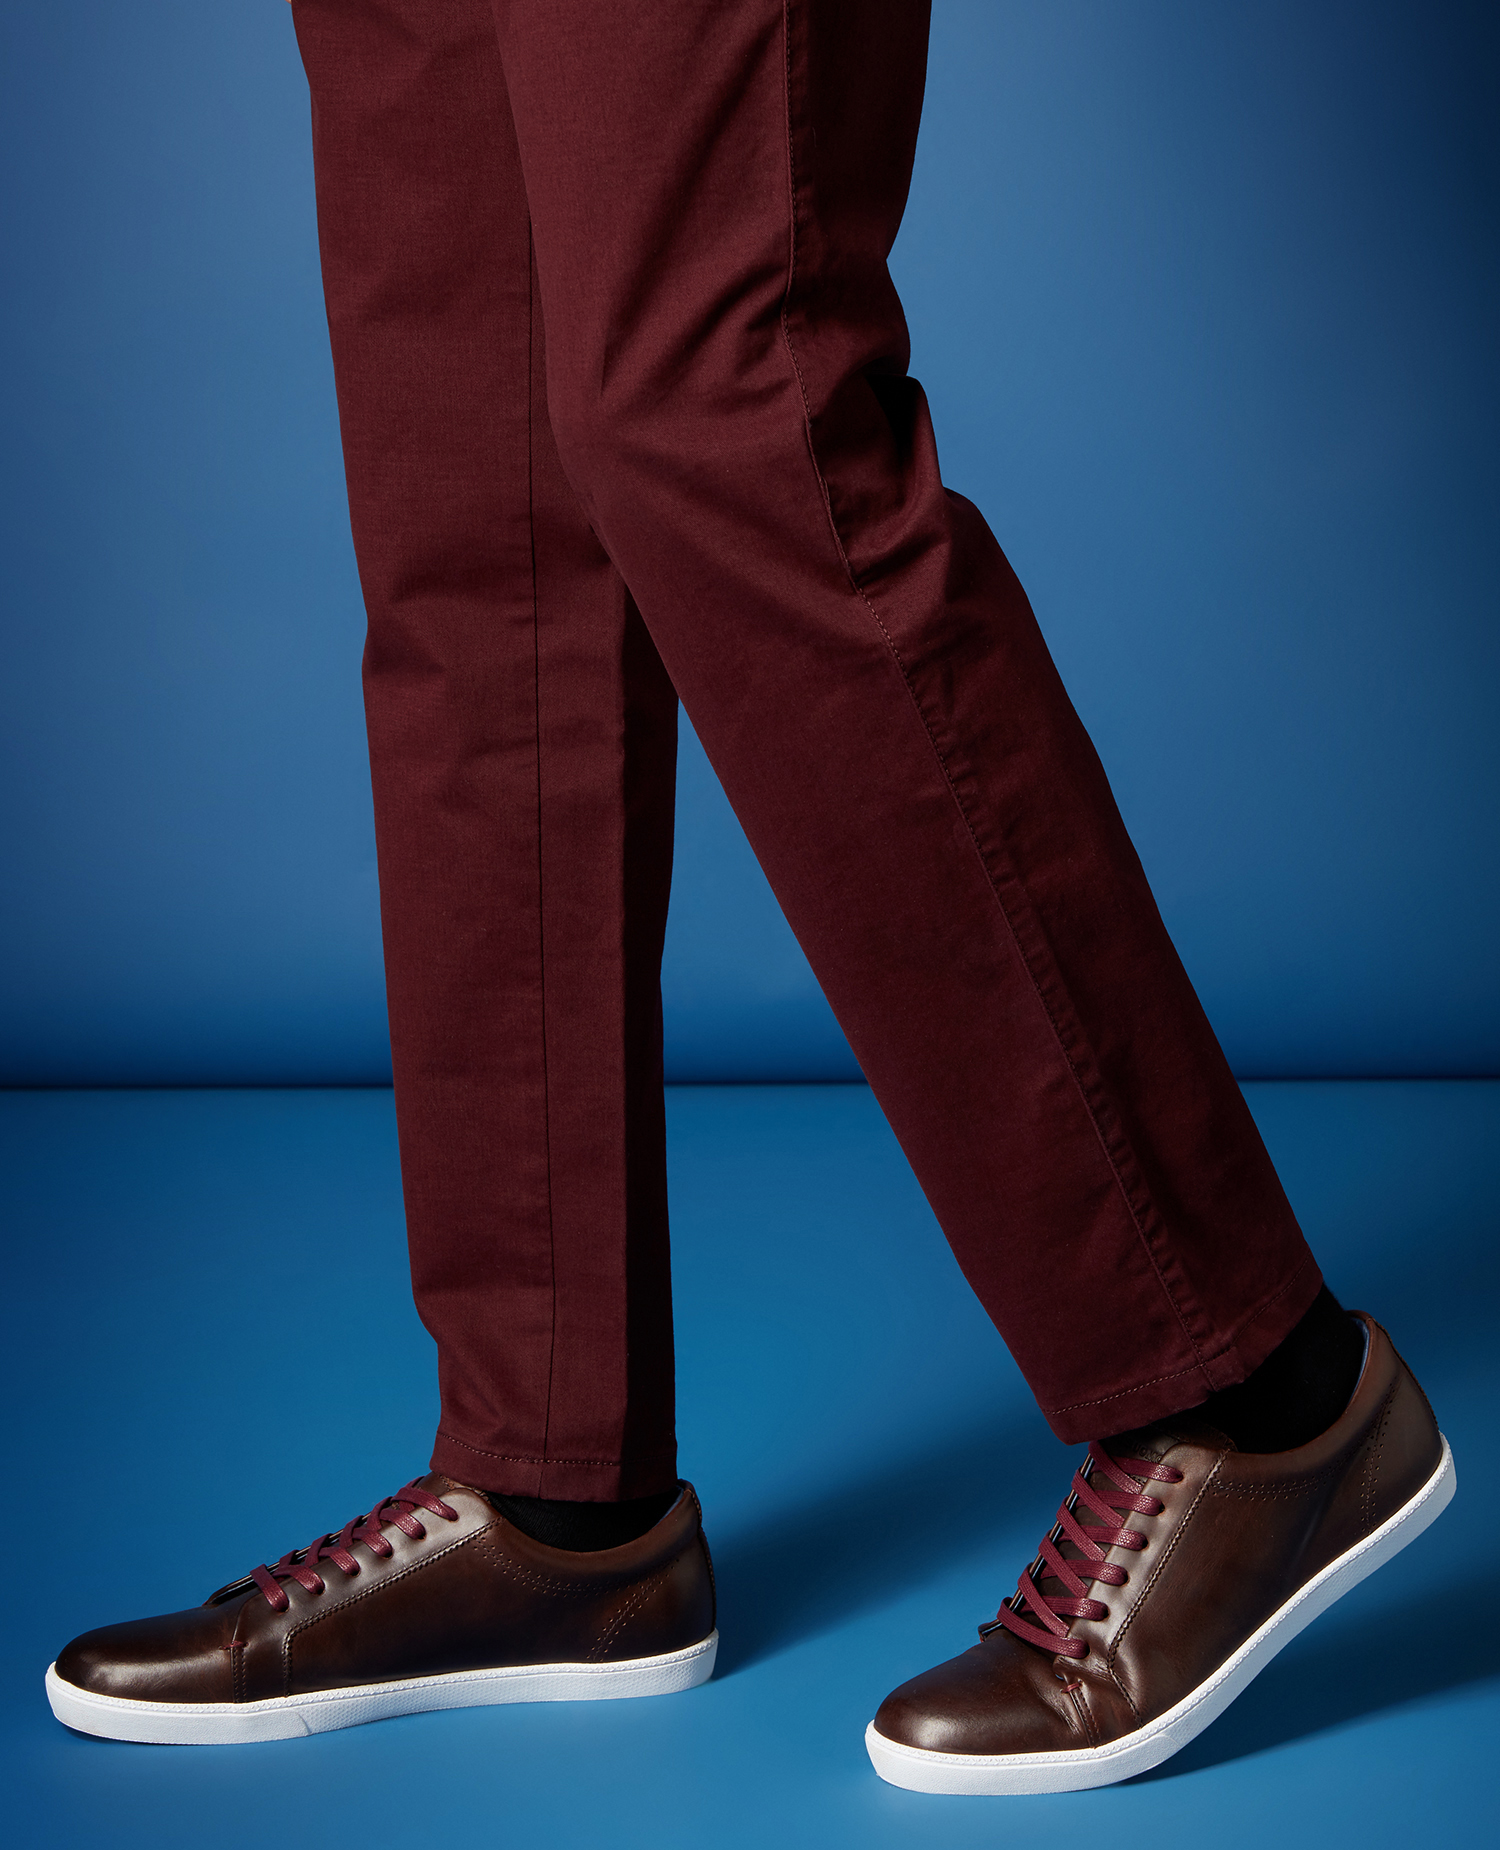 Remus Uomo Brown Casual Shoe